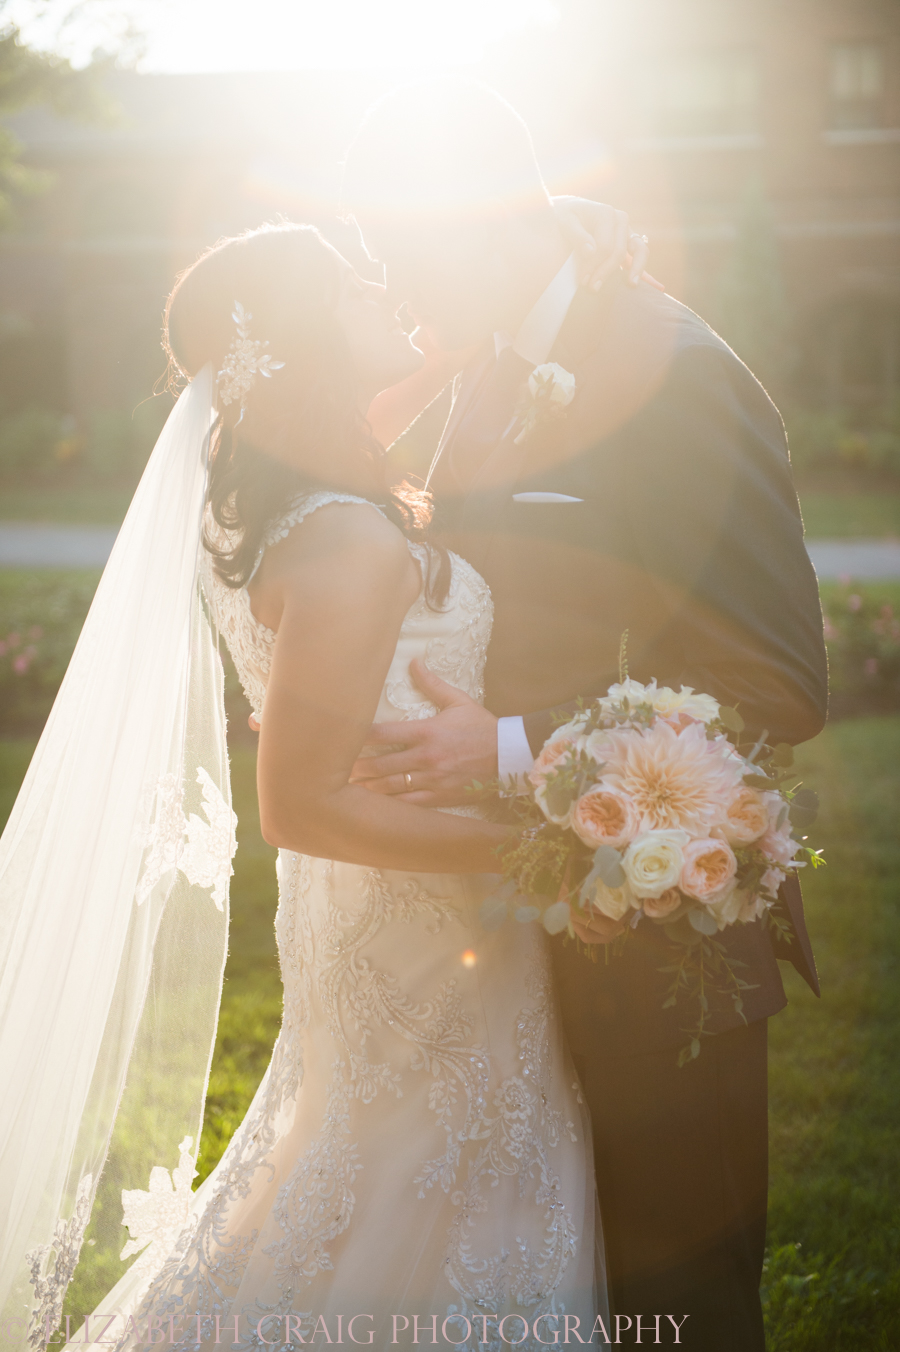 pittsburgh-greek-weddings-fairmont-weddings-receptions-elizabeth-craig-photohgraphy-013